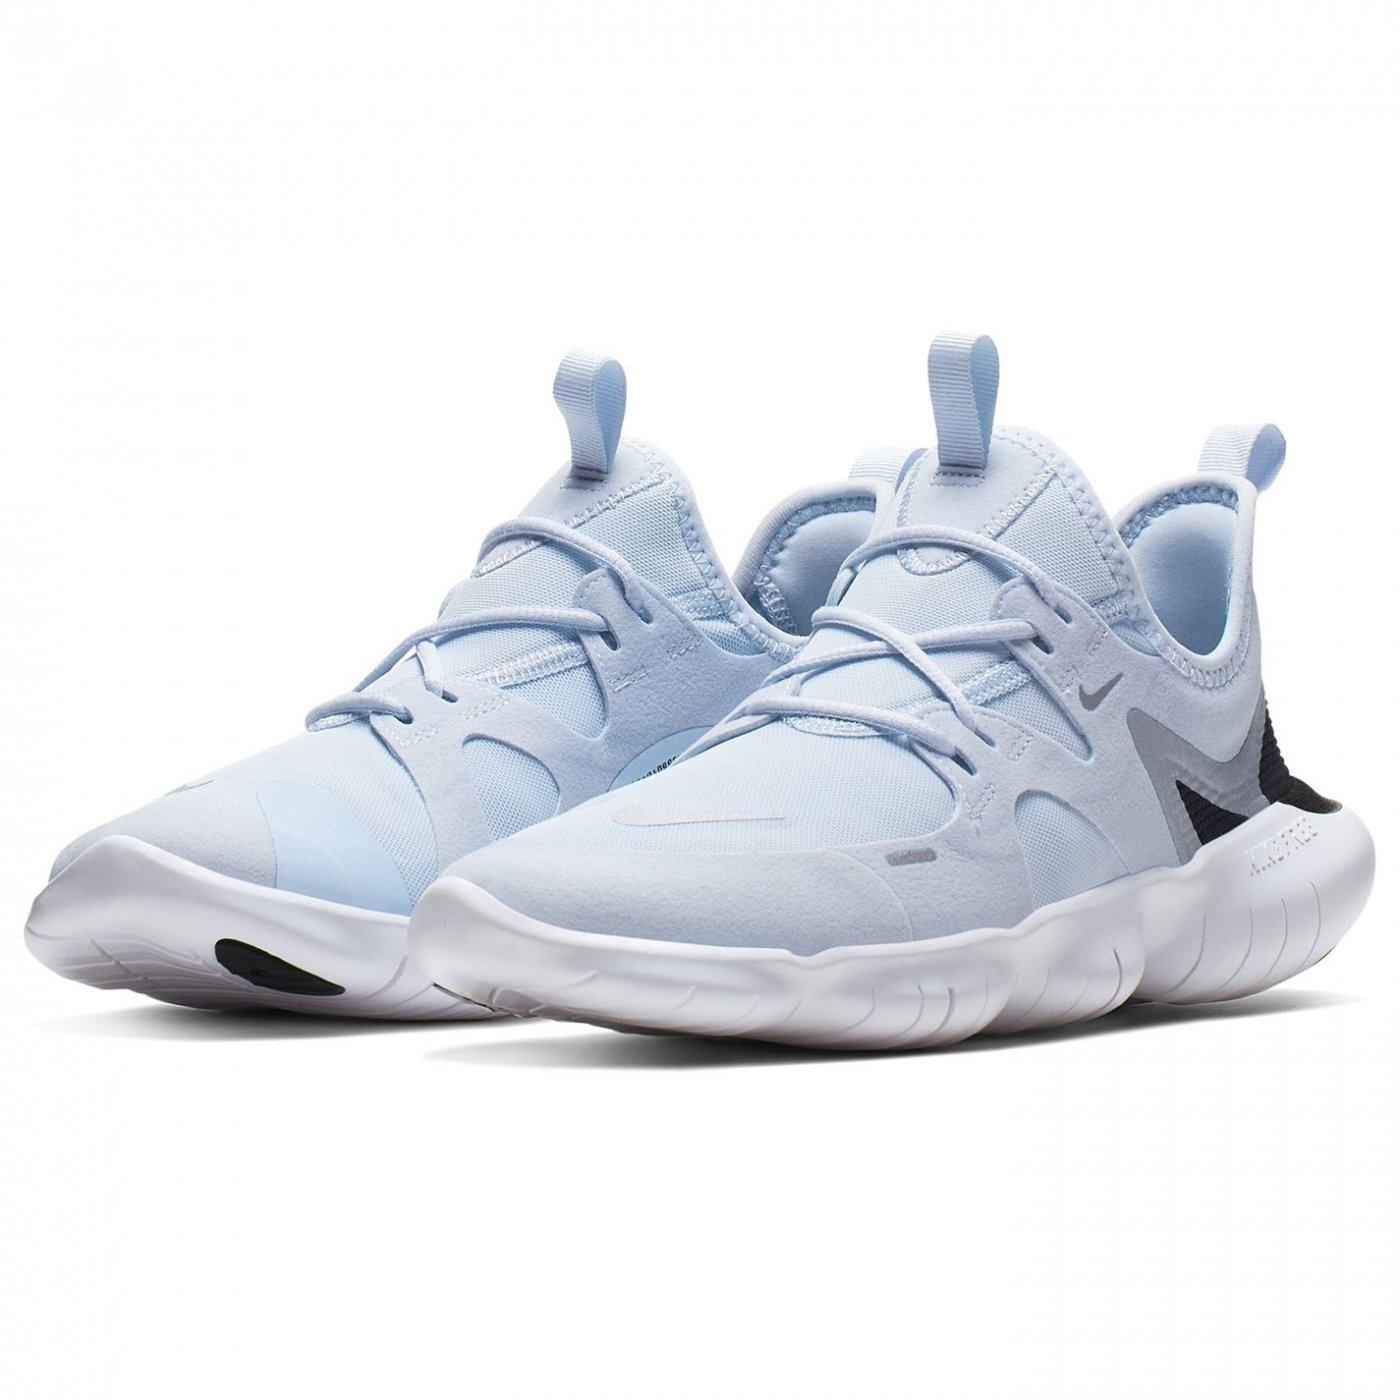 official photos 1541f 3cab9 ... Free Run 5.0 Junior Running Shoes. Novo Nike ...